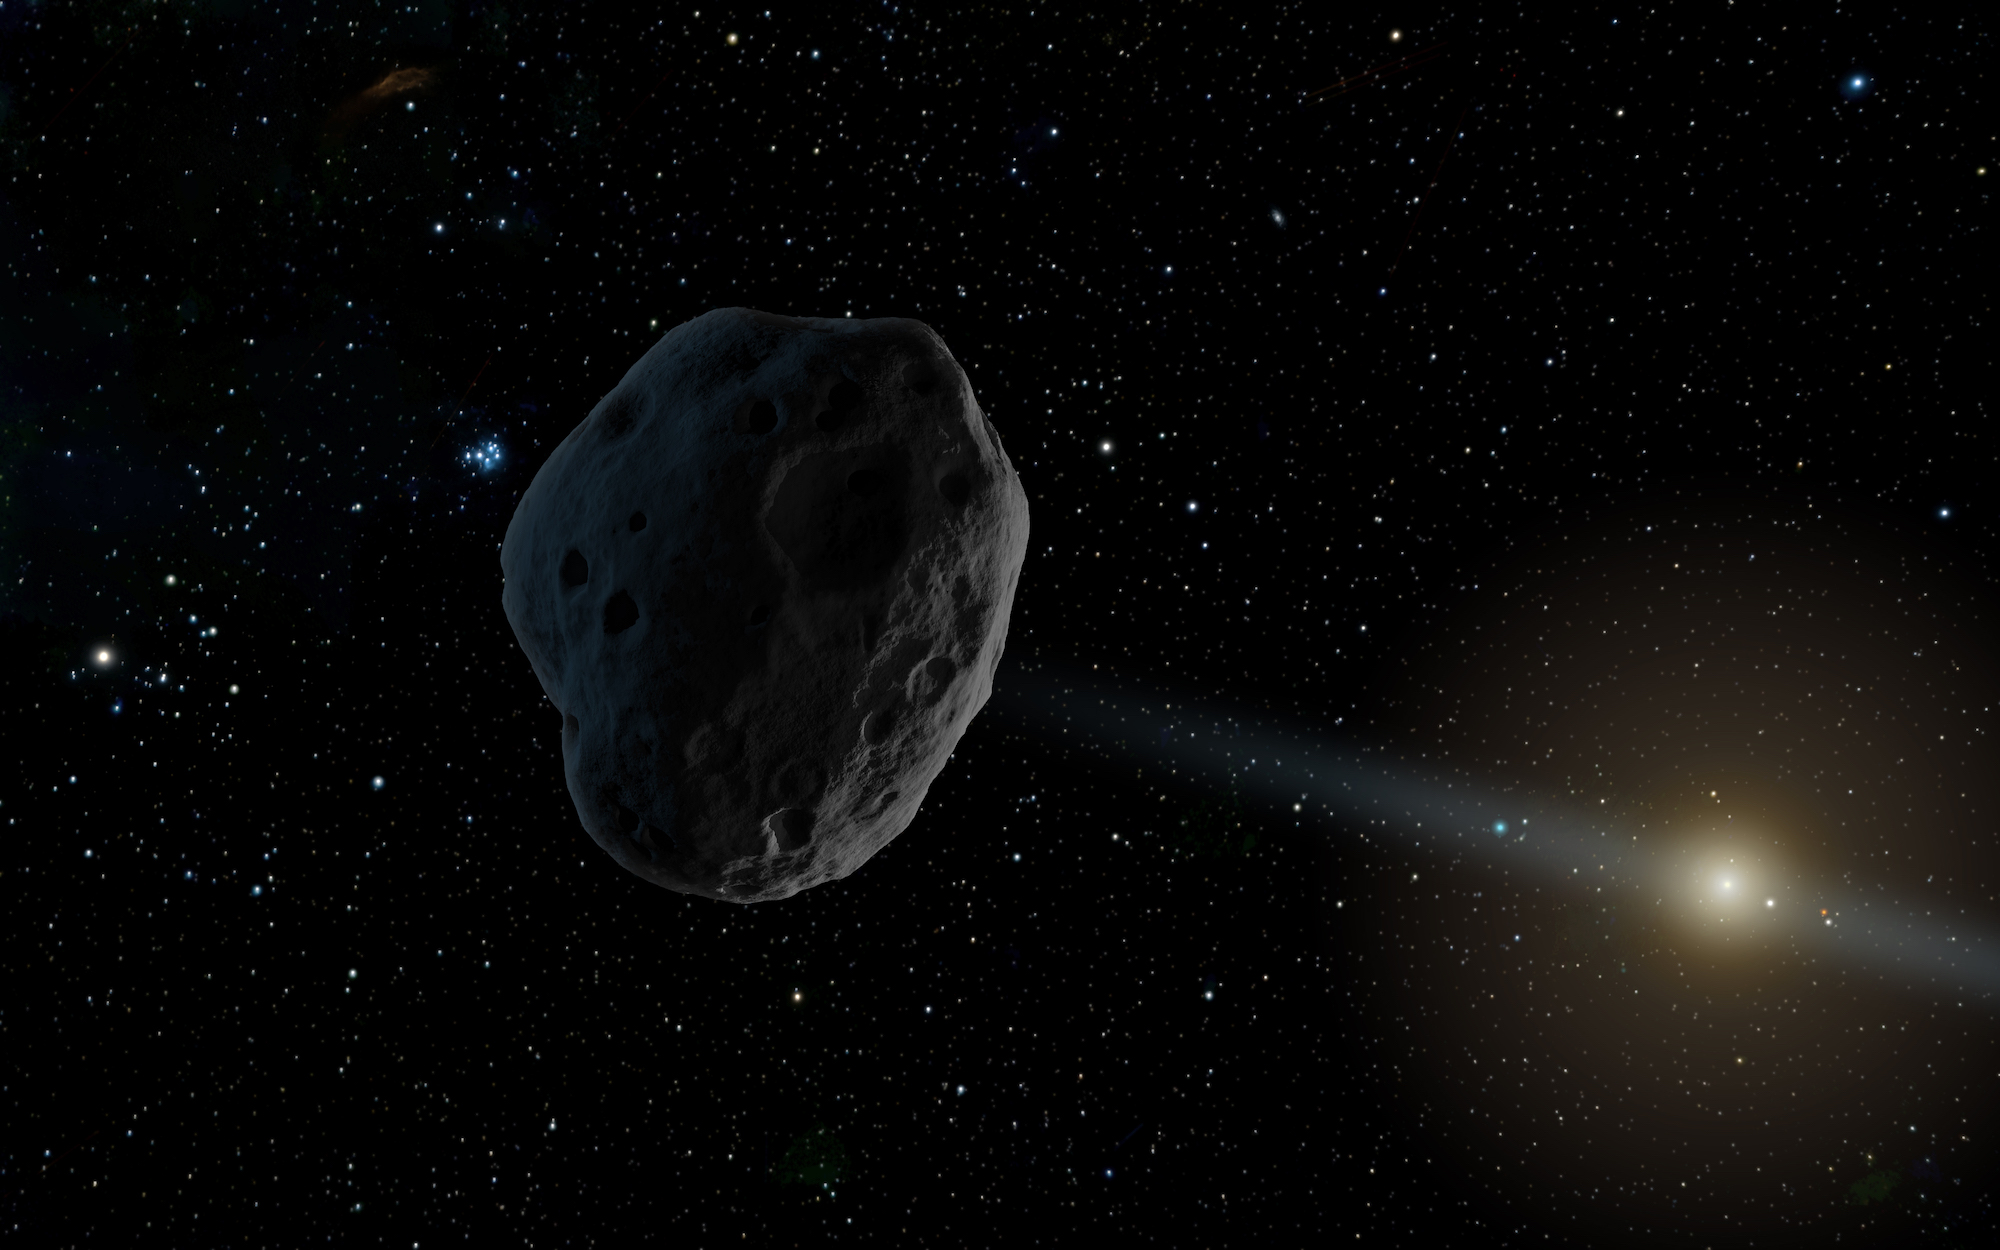 Grande asteróide passa perto da Terra dia 1 de setembro